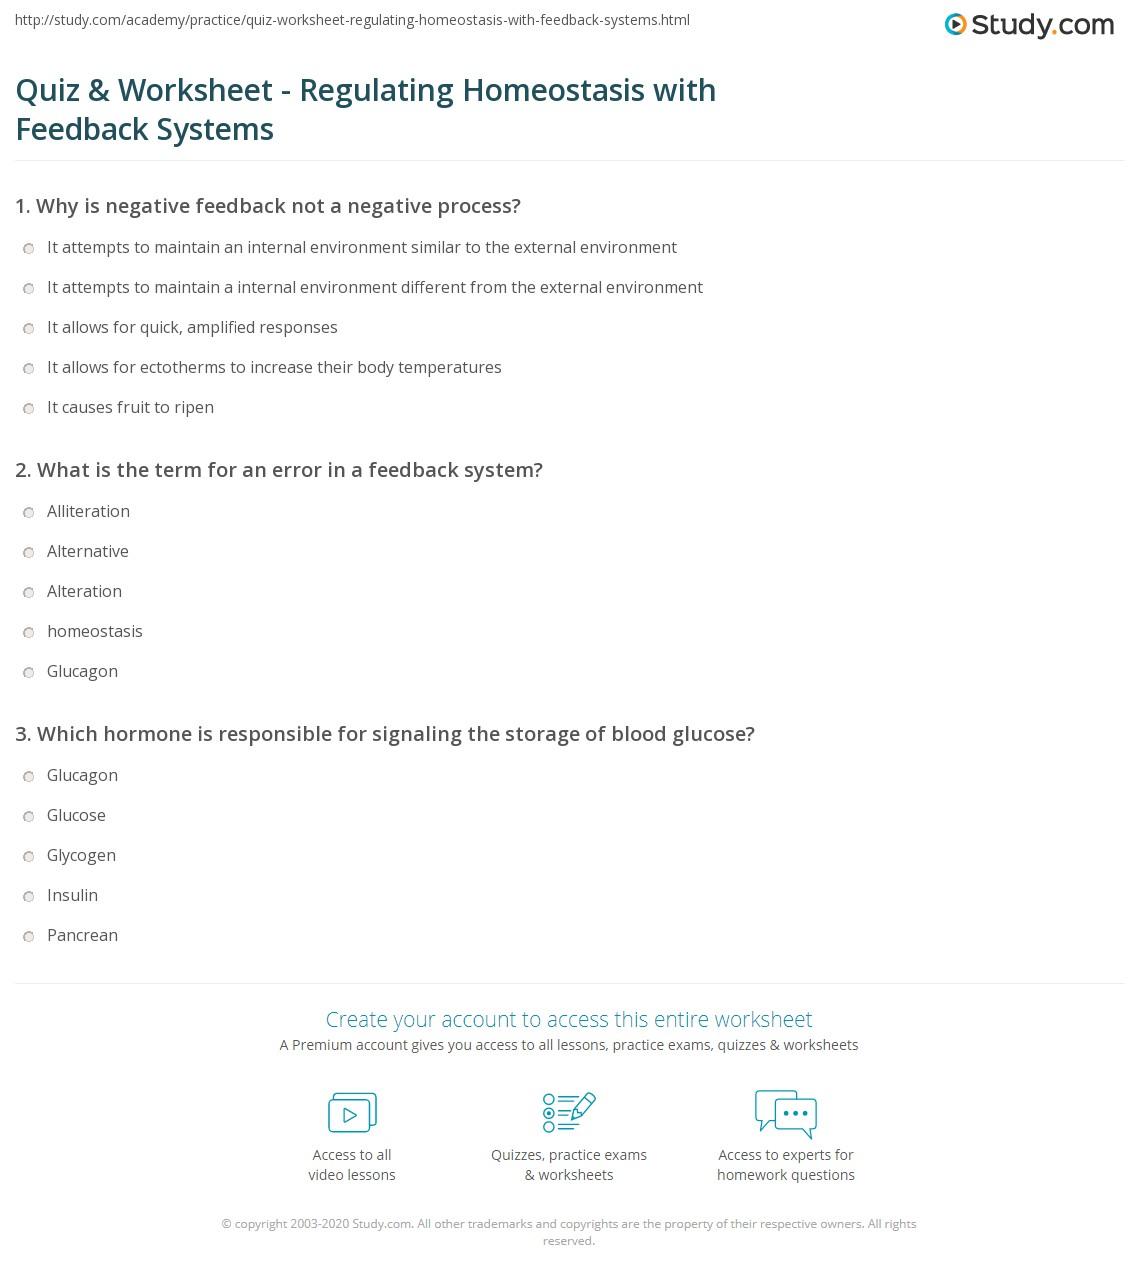 Worksheets Homeostasis Worksheet quiz worksheet regulating homeostasis with feedback systems print using to regulate growth reproduction dynamic worksheet